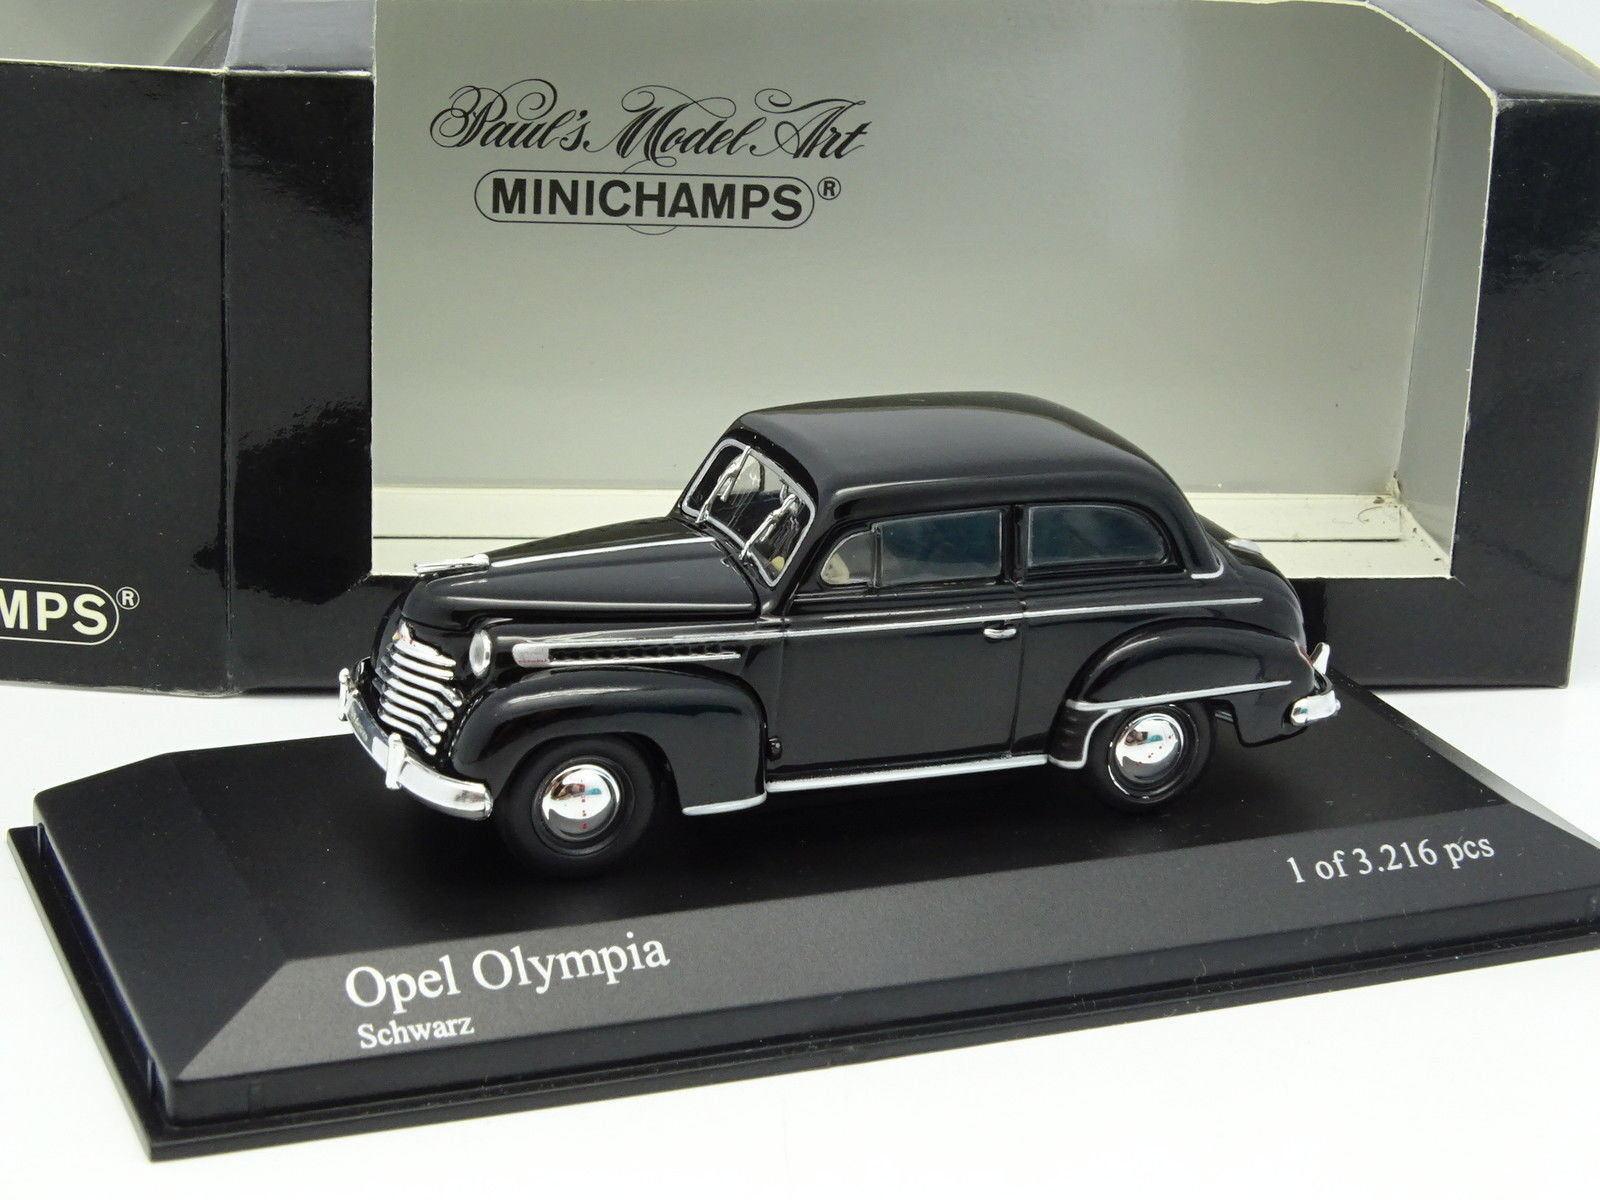 Minichamps 1 43 - Opel Olympia Negra